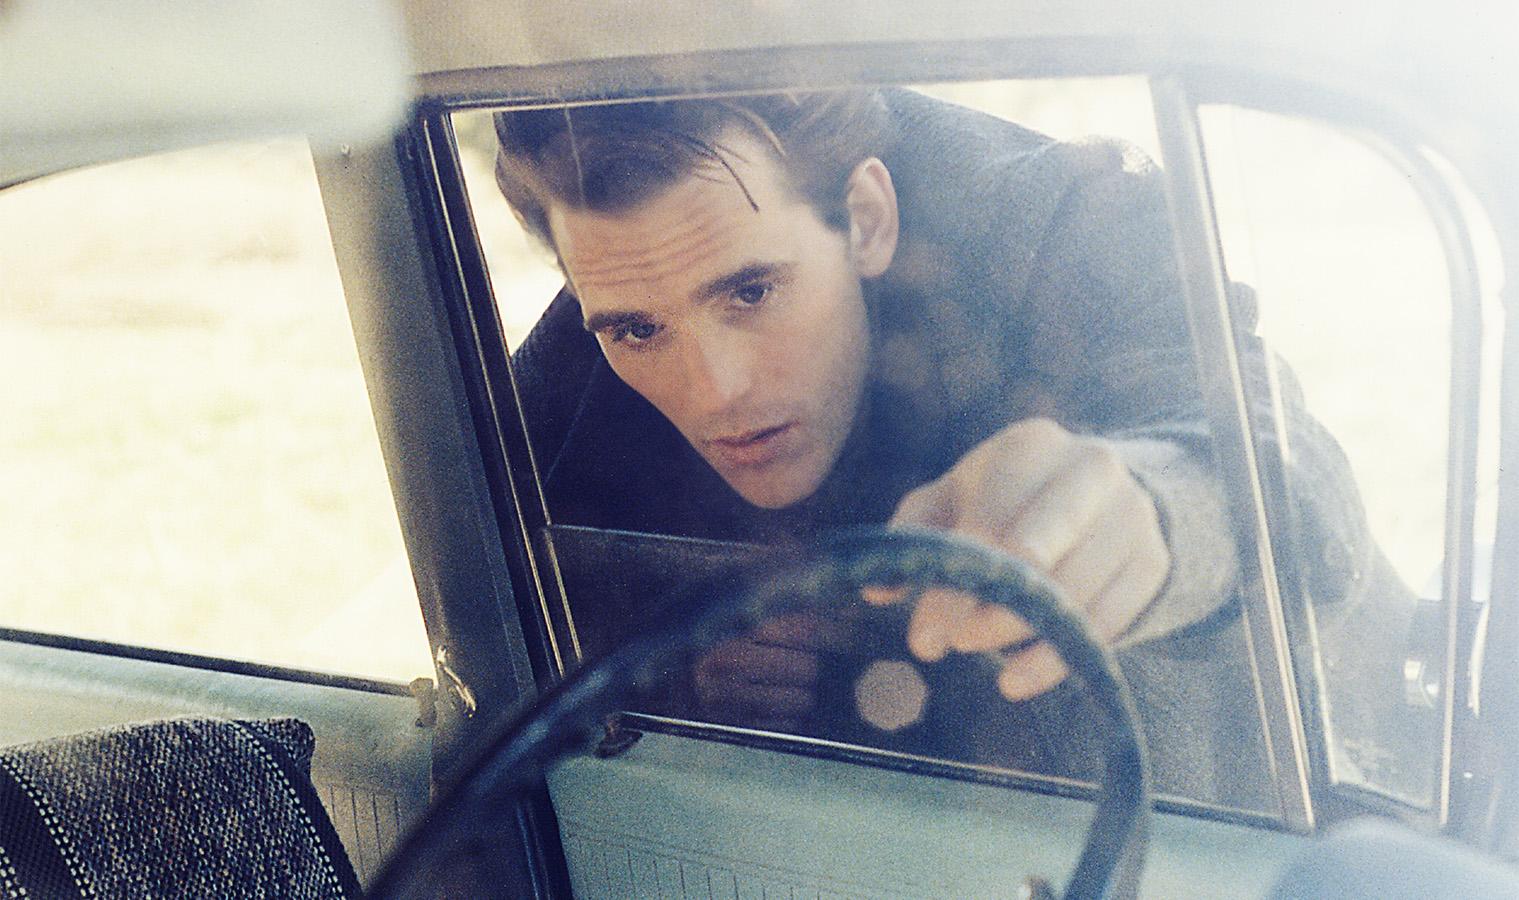 Matt Dillon in Montana by Patrik Andersson